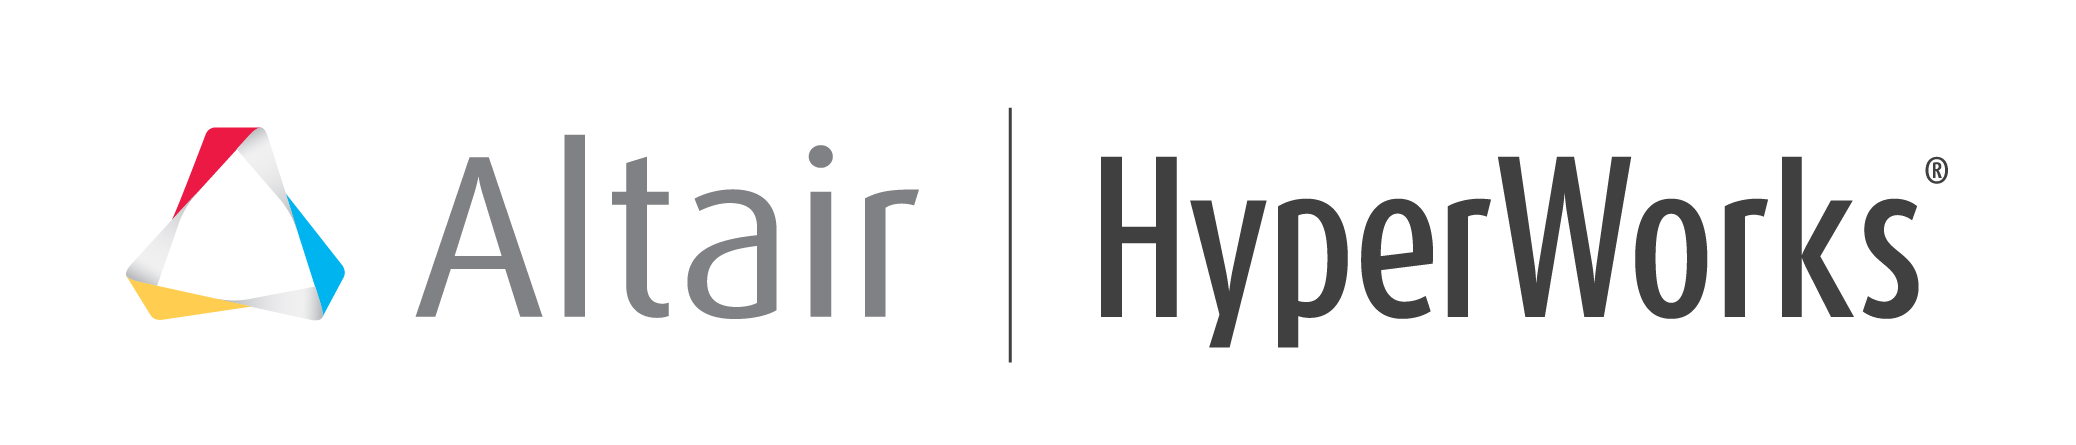 Altair_HyperWorks_RGB_horizontal.png